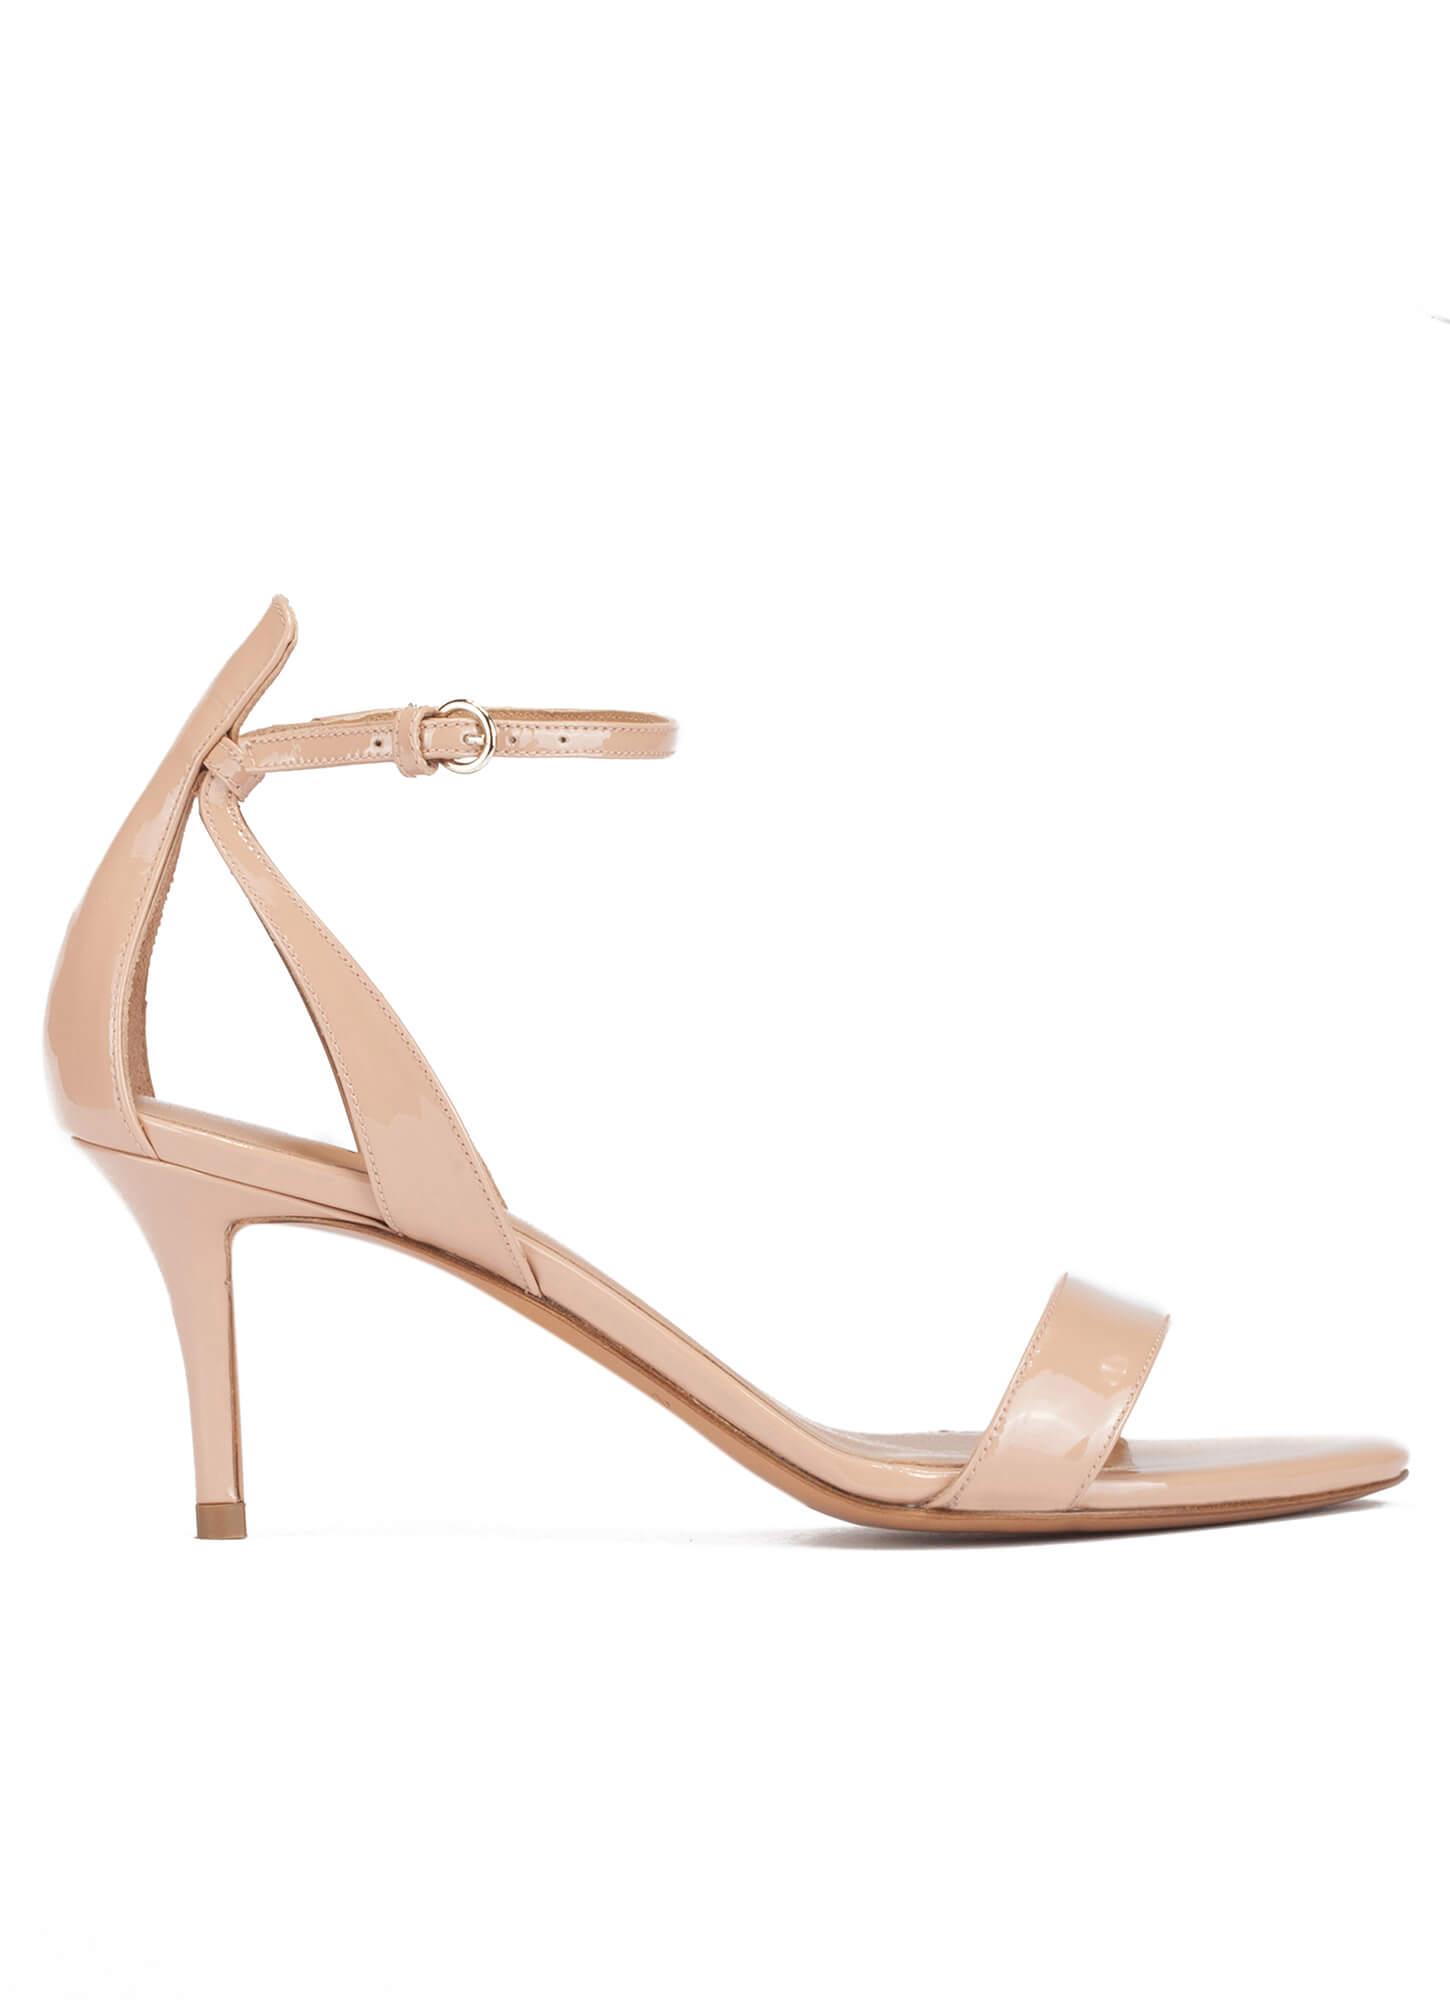 0d31308e4418a Ankle strap mid stiletto heel sandals in nude patent . PURA LOPEZ